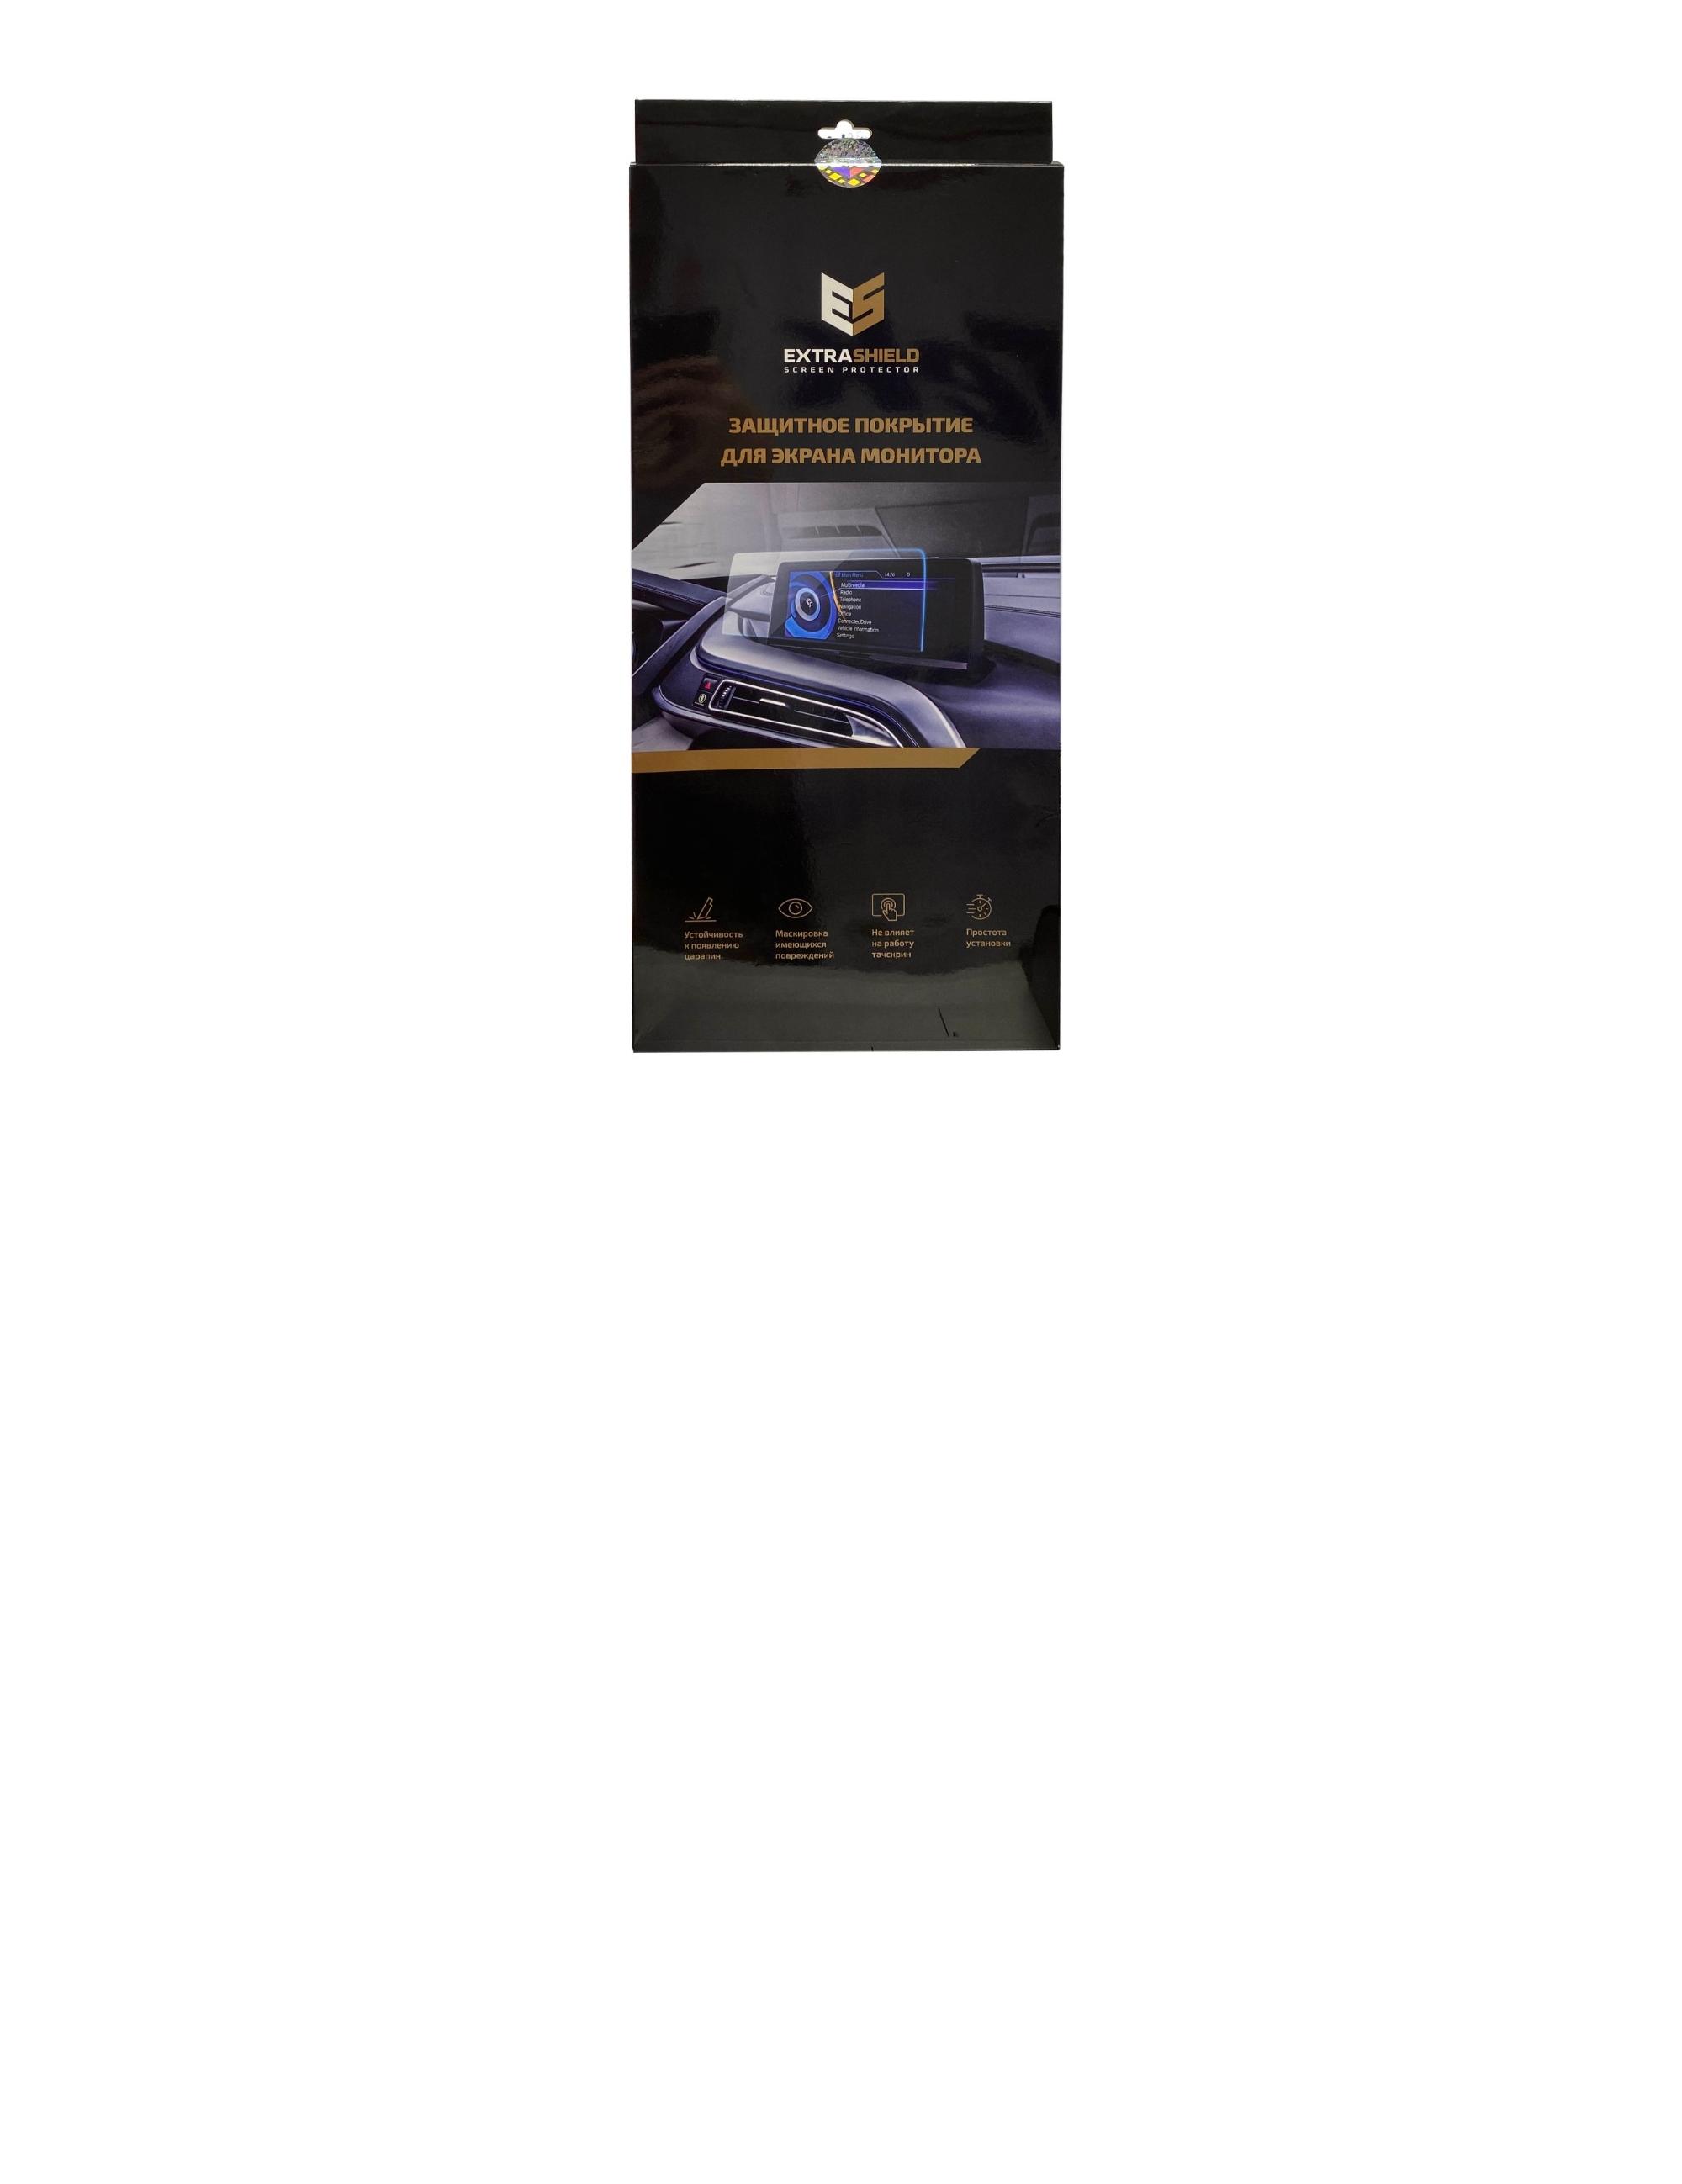 BMW 5 серия  (F10/ F11/ F07) 2013 - 2017 мультимедиа NBT EVO 10,2 Статическая пленка Глянец